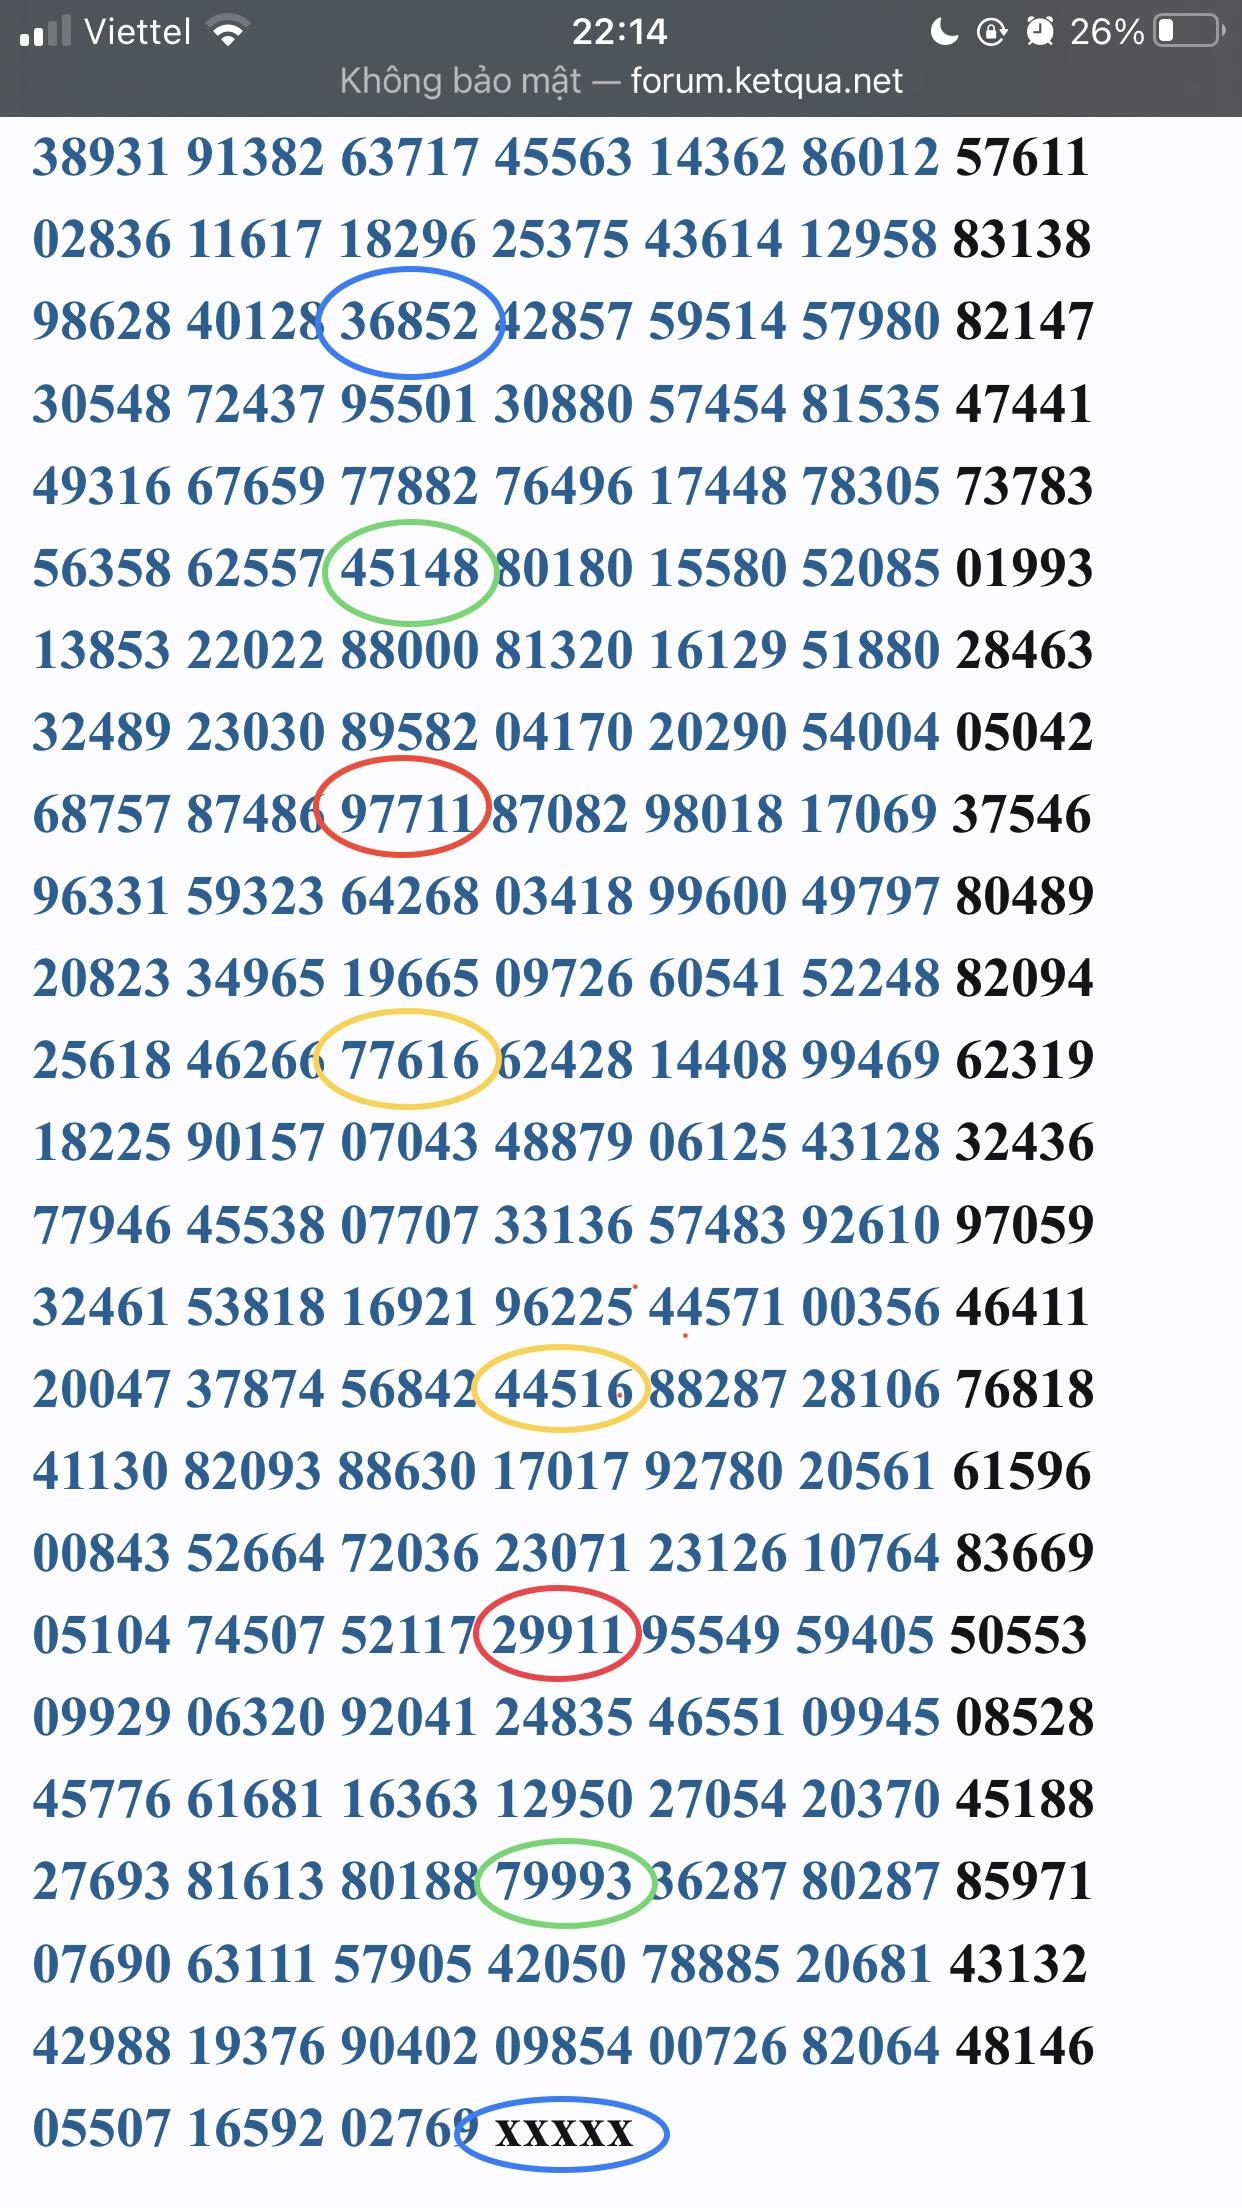 3D063C58-2EBA-4870-A28E-7BC6361E9E94.jpeg